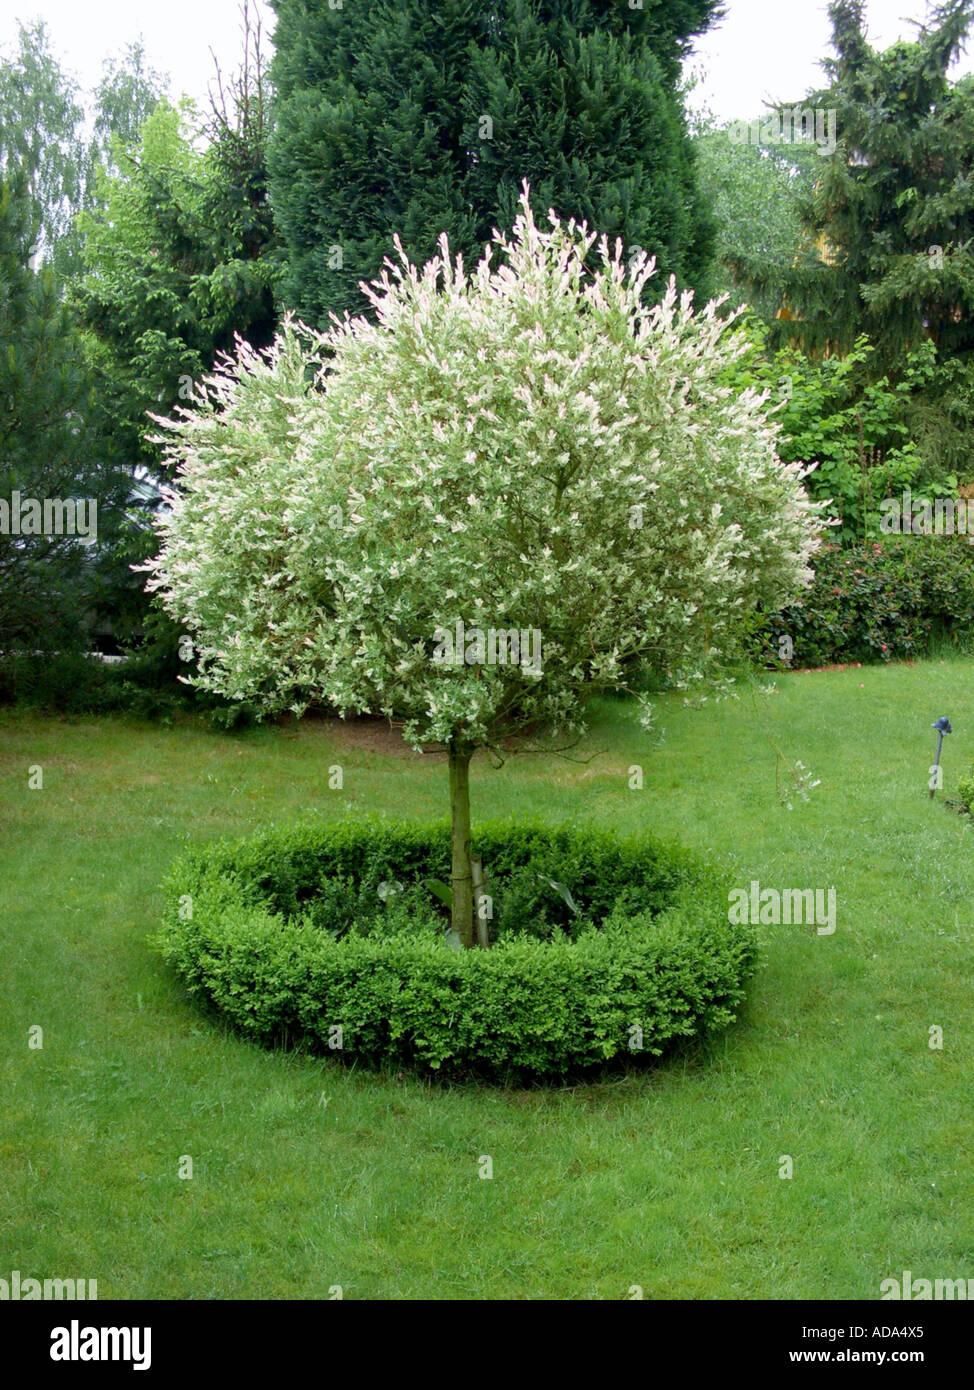 Gefleckte Willow Bunte Weide Salix Integra Hakuro Nishiki